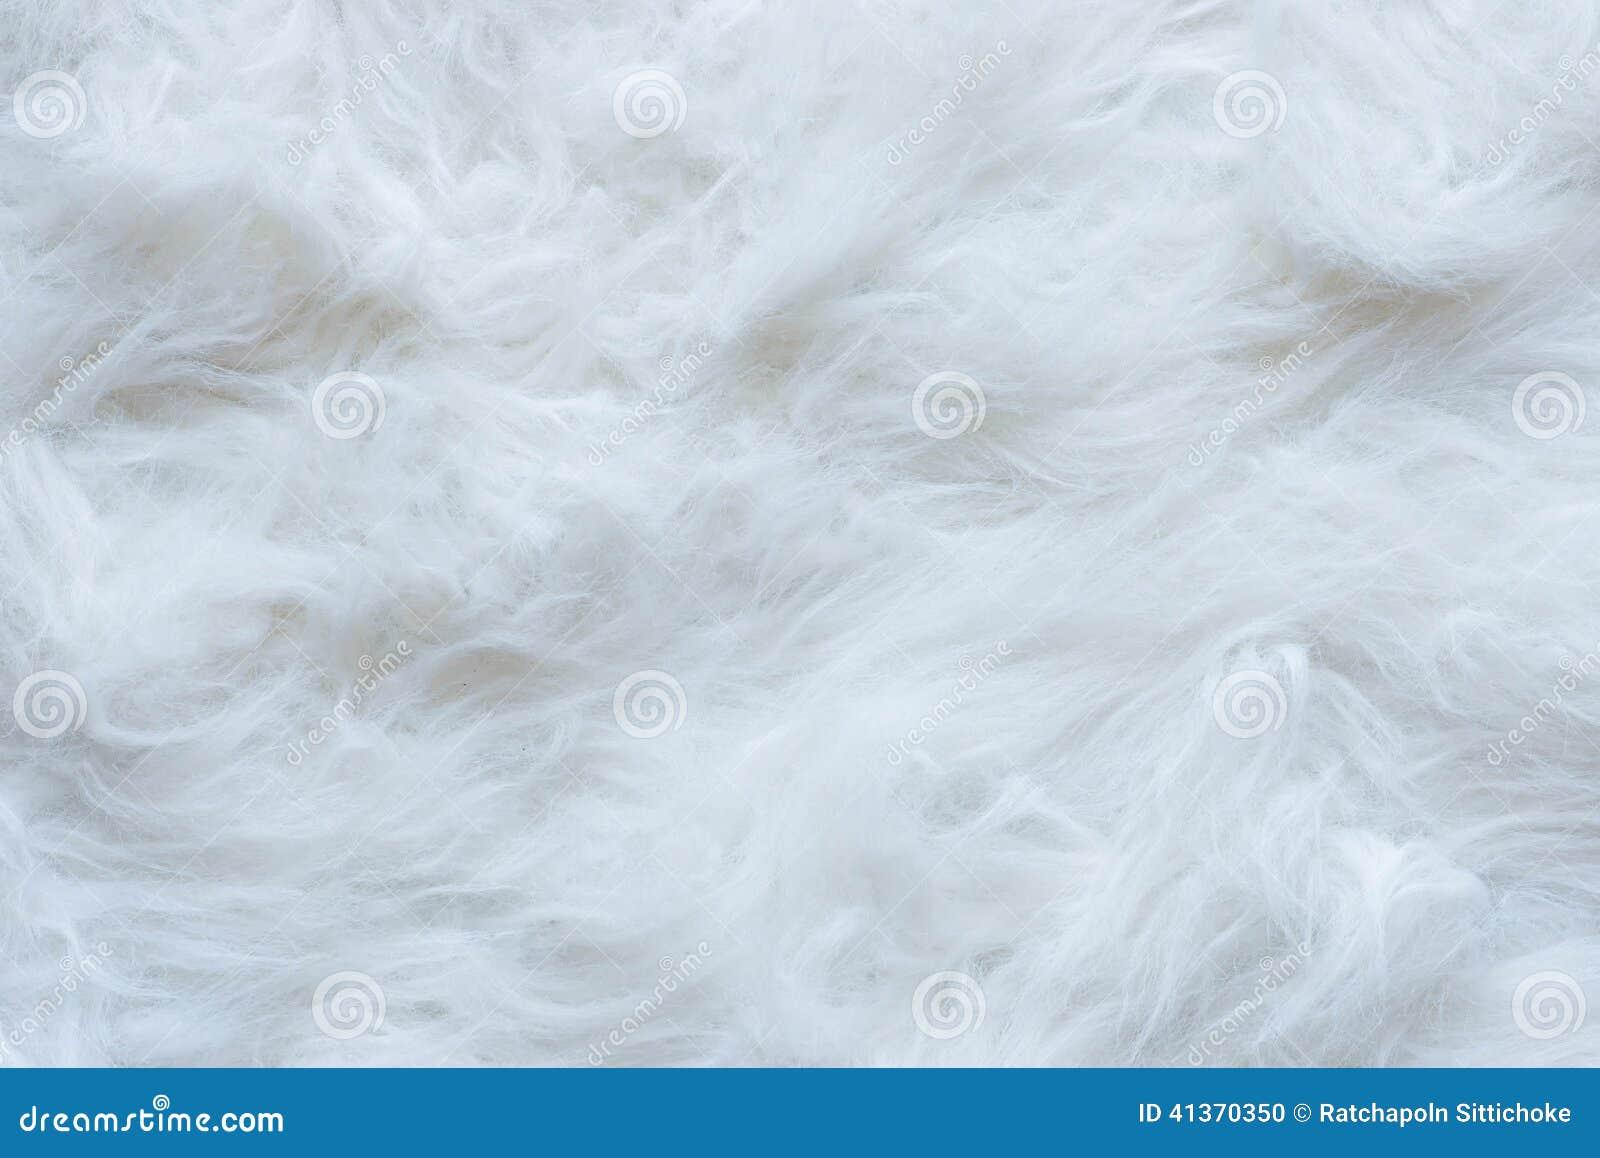 Cotton Wool Texture Stock Photo Image 41370350